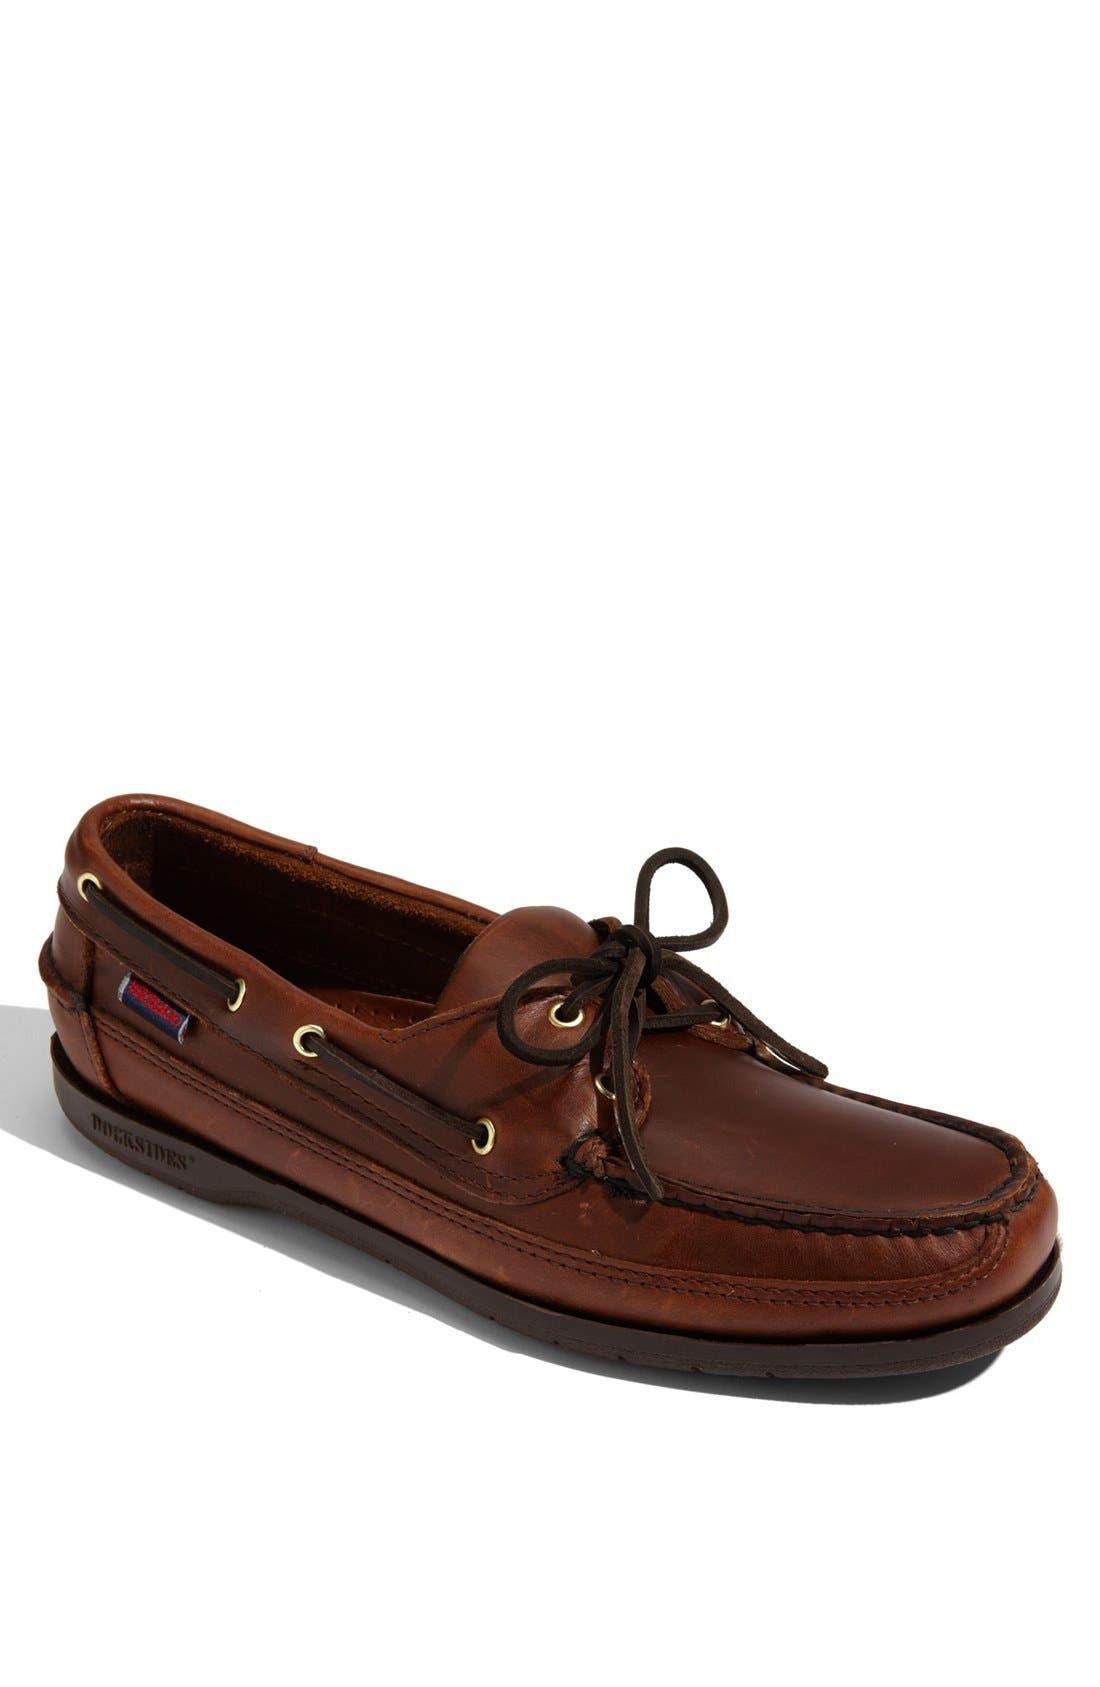 s sebago shoes nordstrom